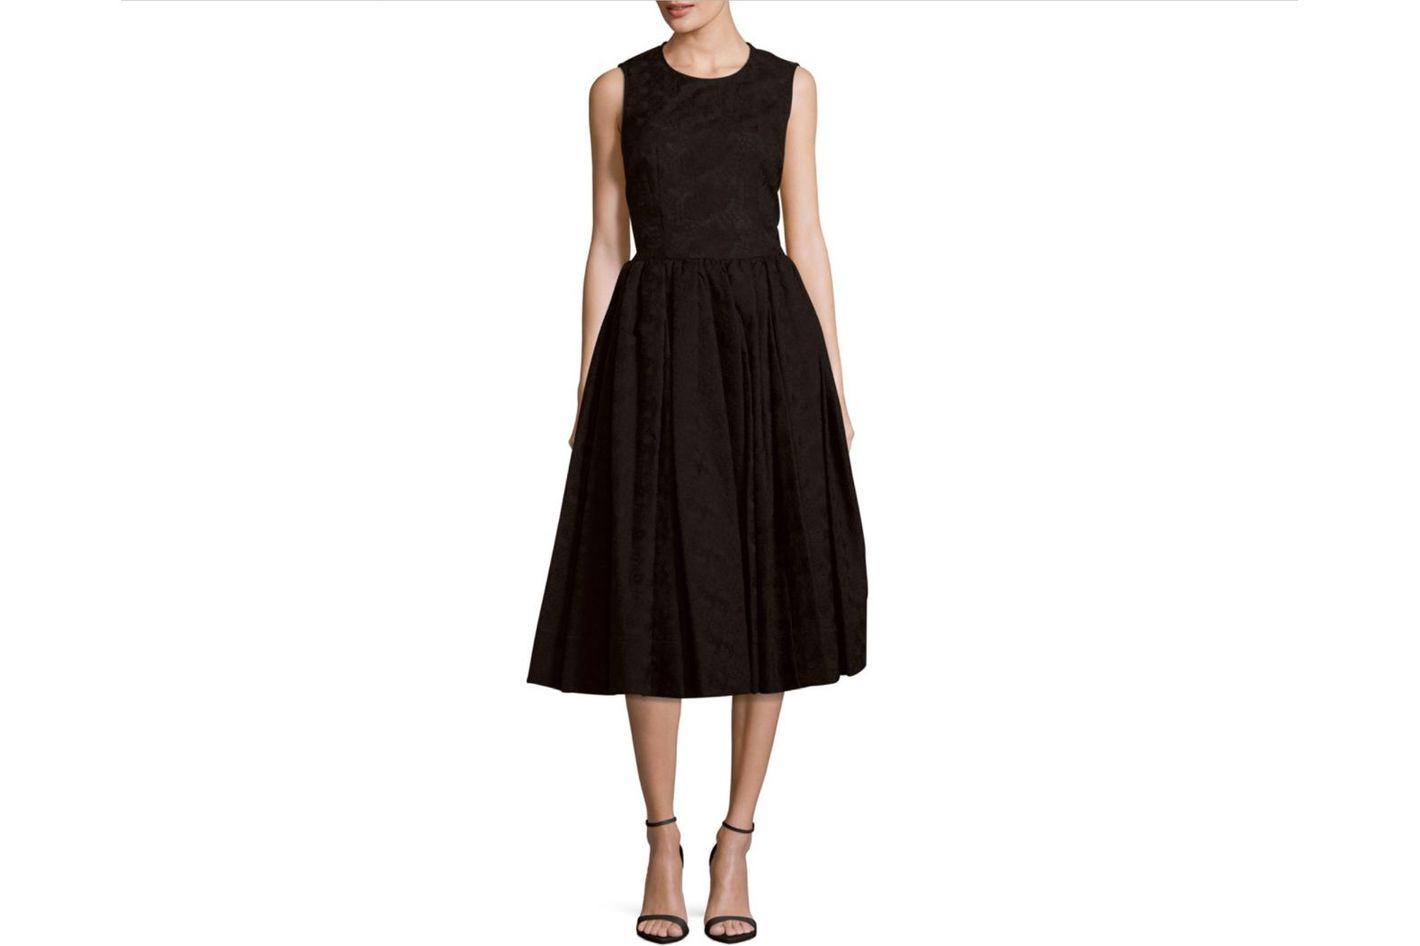 Comme des Garçons Sleeveless Lace Dress